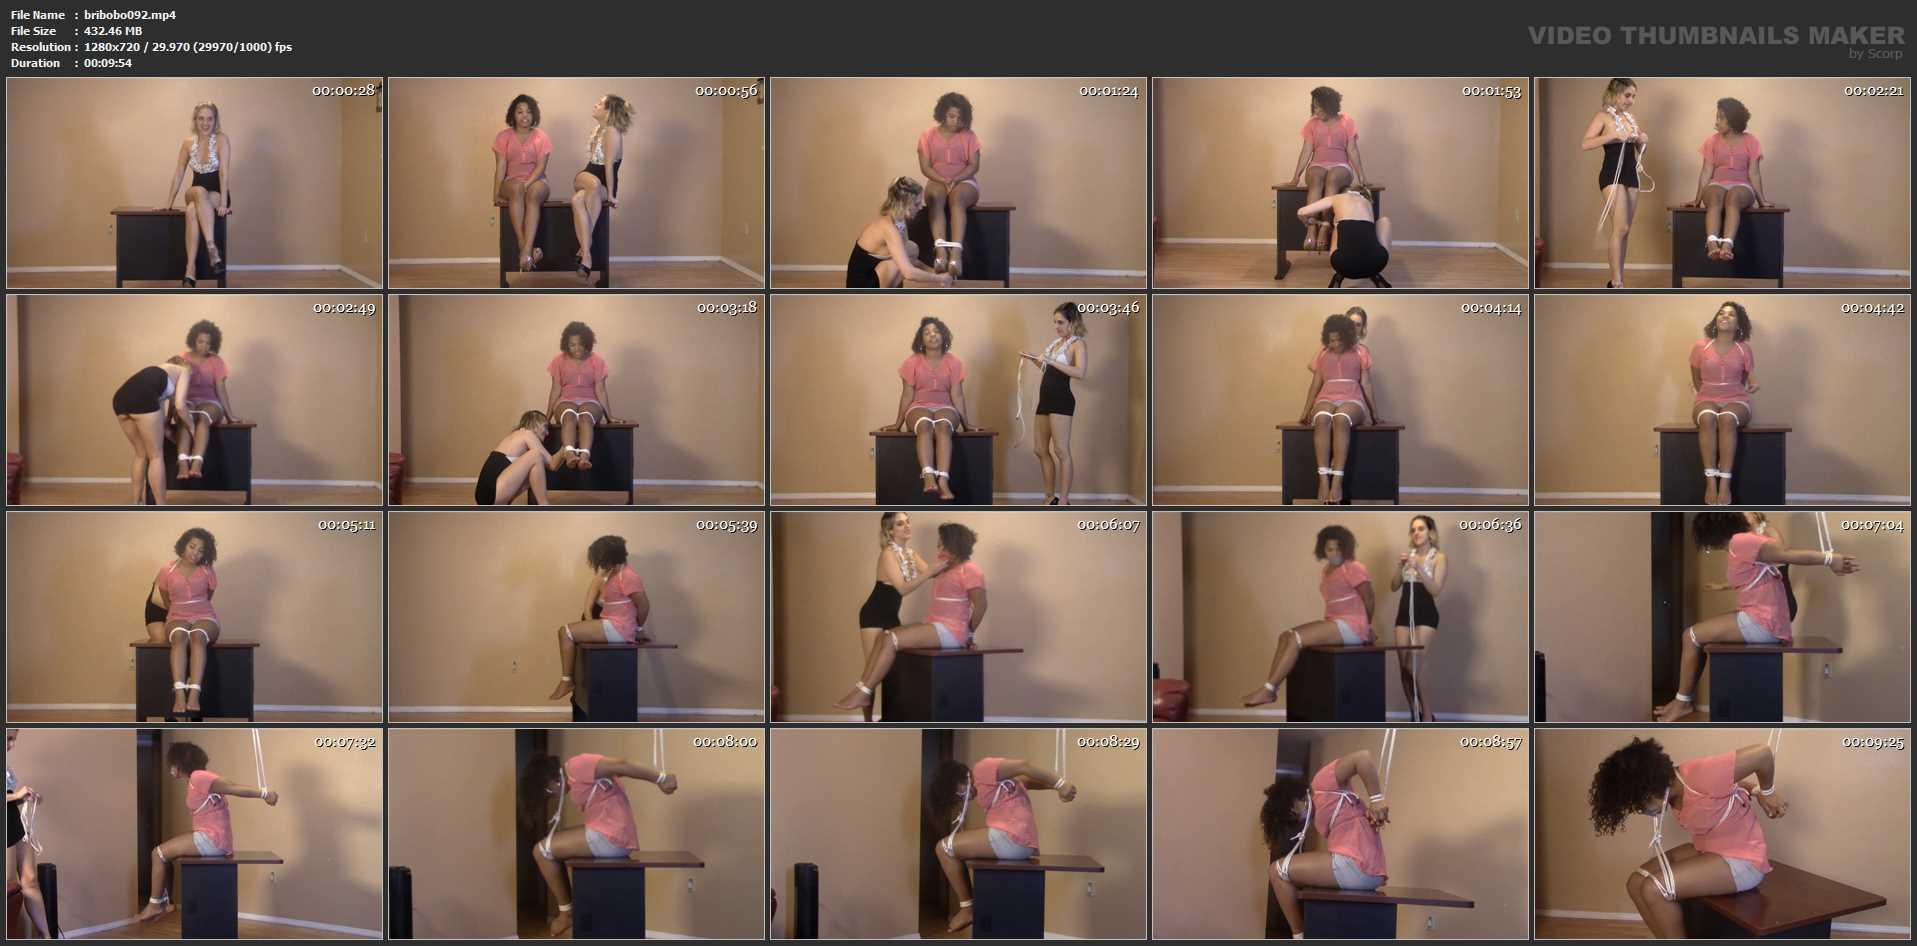 Destiny, Briella Jaden In Scene: Leggy Black 19 year old's first bondage audition - BRIELLASBONDAGEBOUTIQUE - HD/720p/MP4